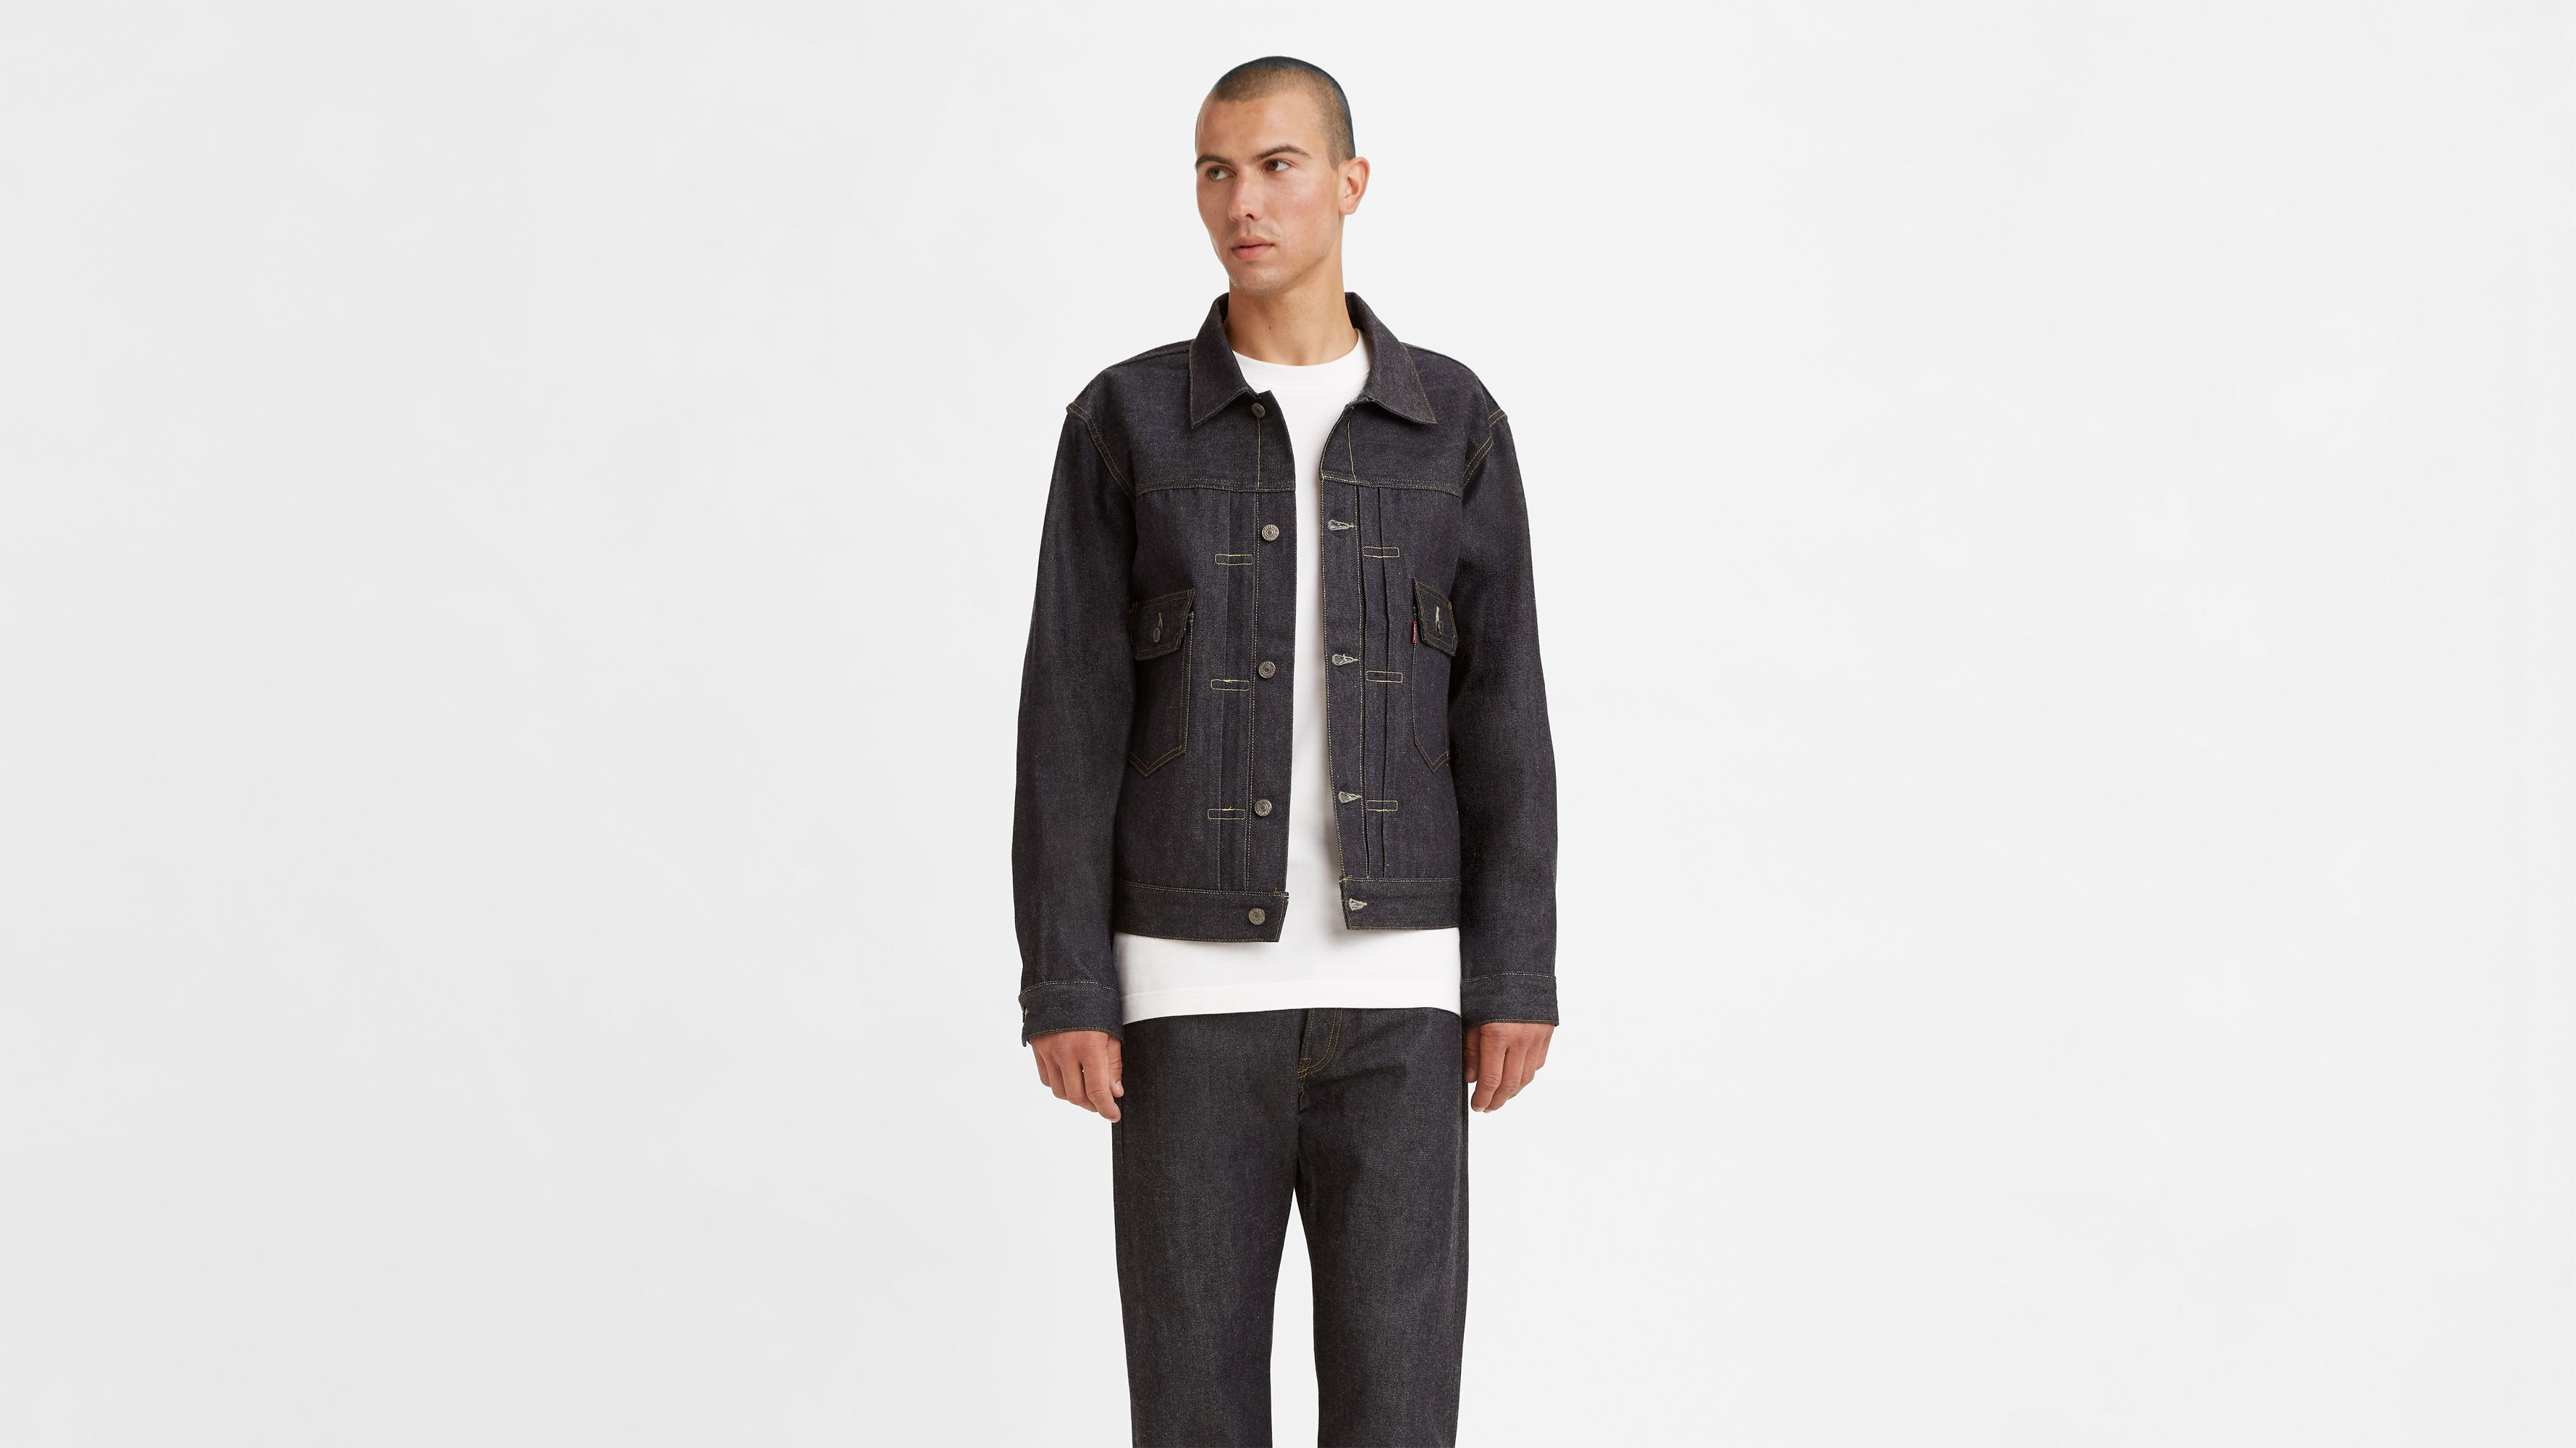 Men's Coats & Jackets | Denim Jackets For Men | Levi's